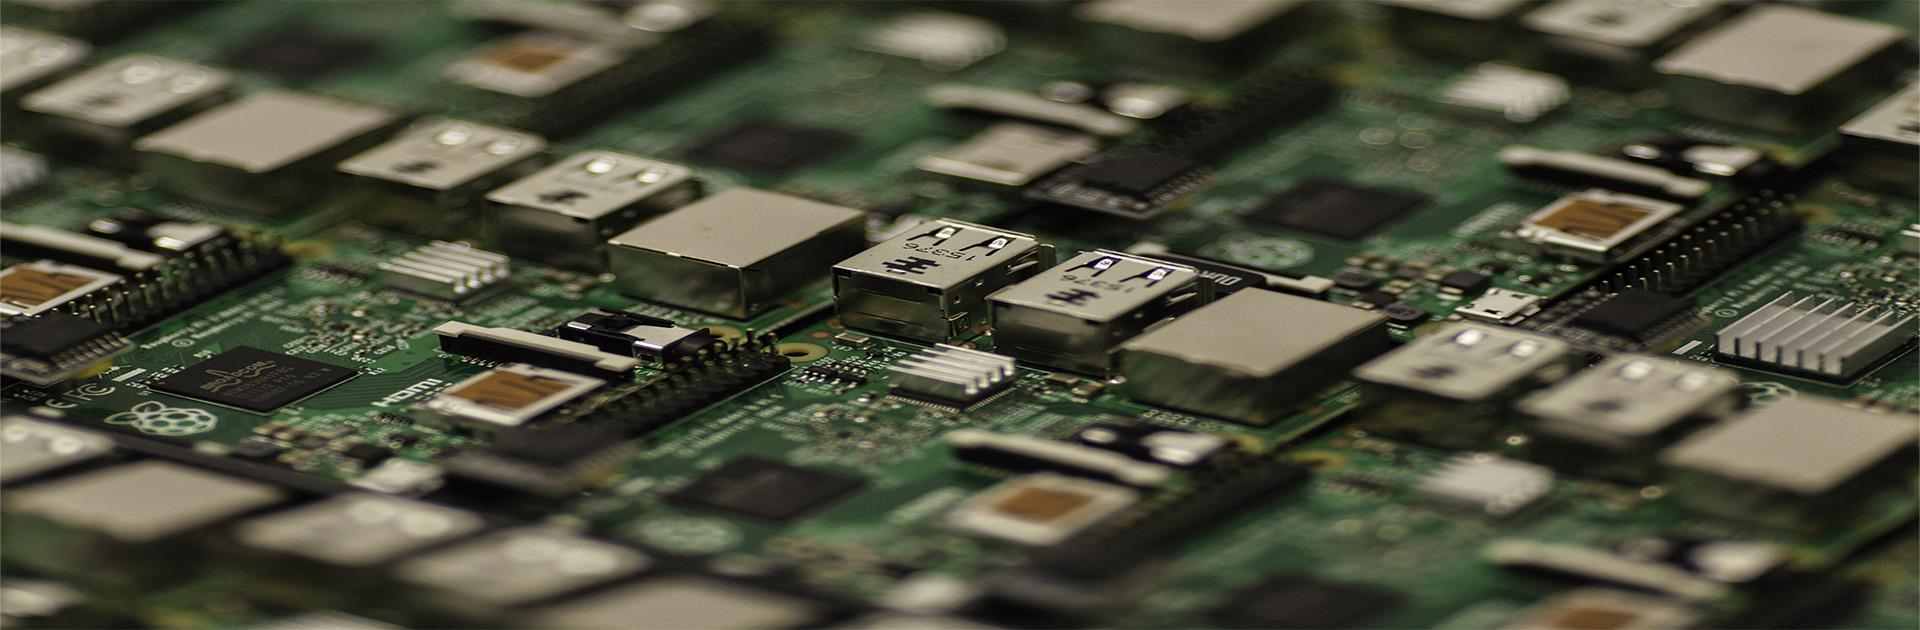 computer-motherboard1